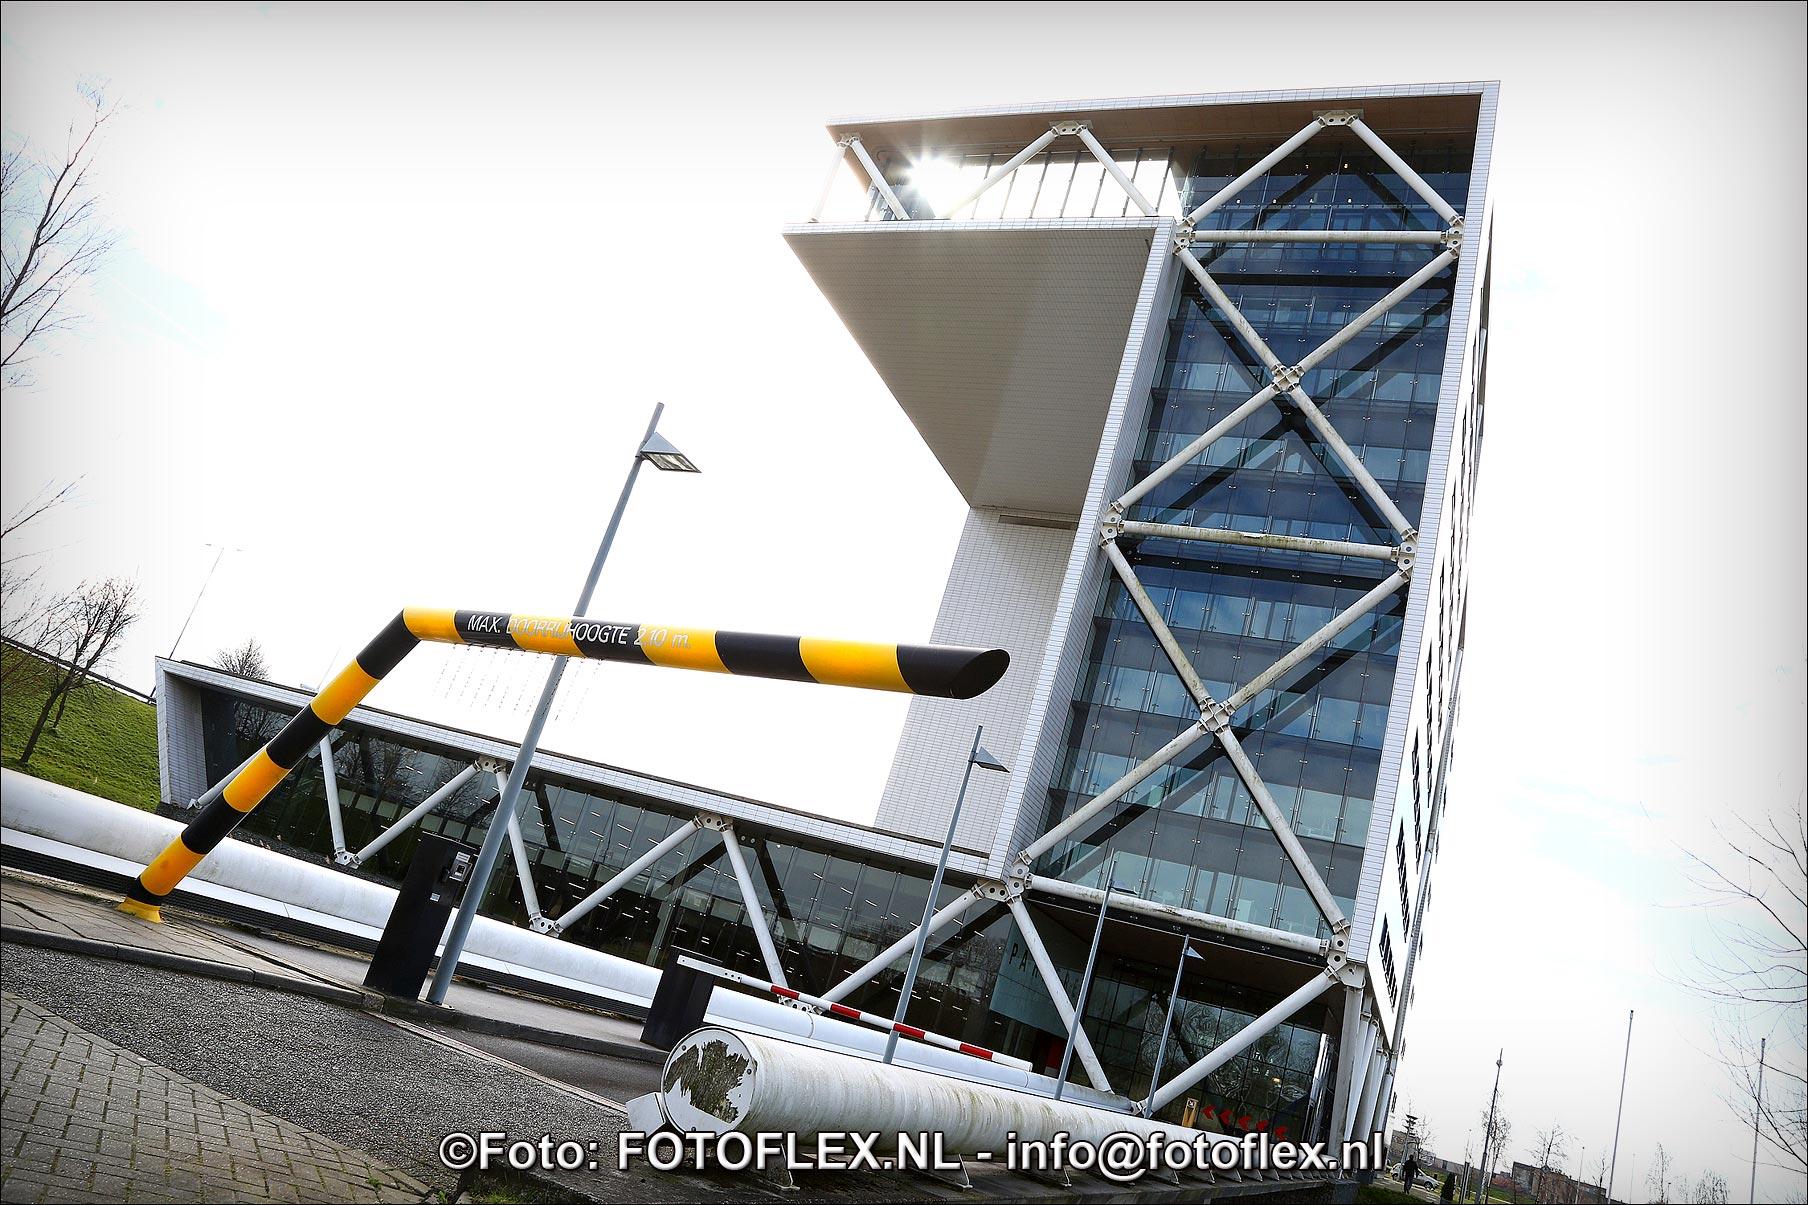 STAD-LM-01-B-FLEX2299-CopyrightFOTOFLEX.NL-17032020